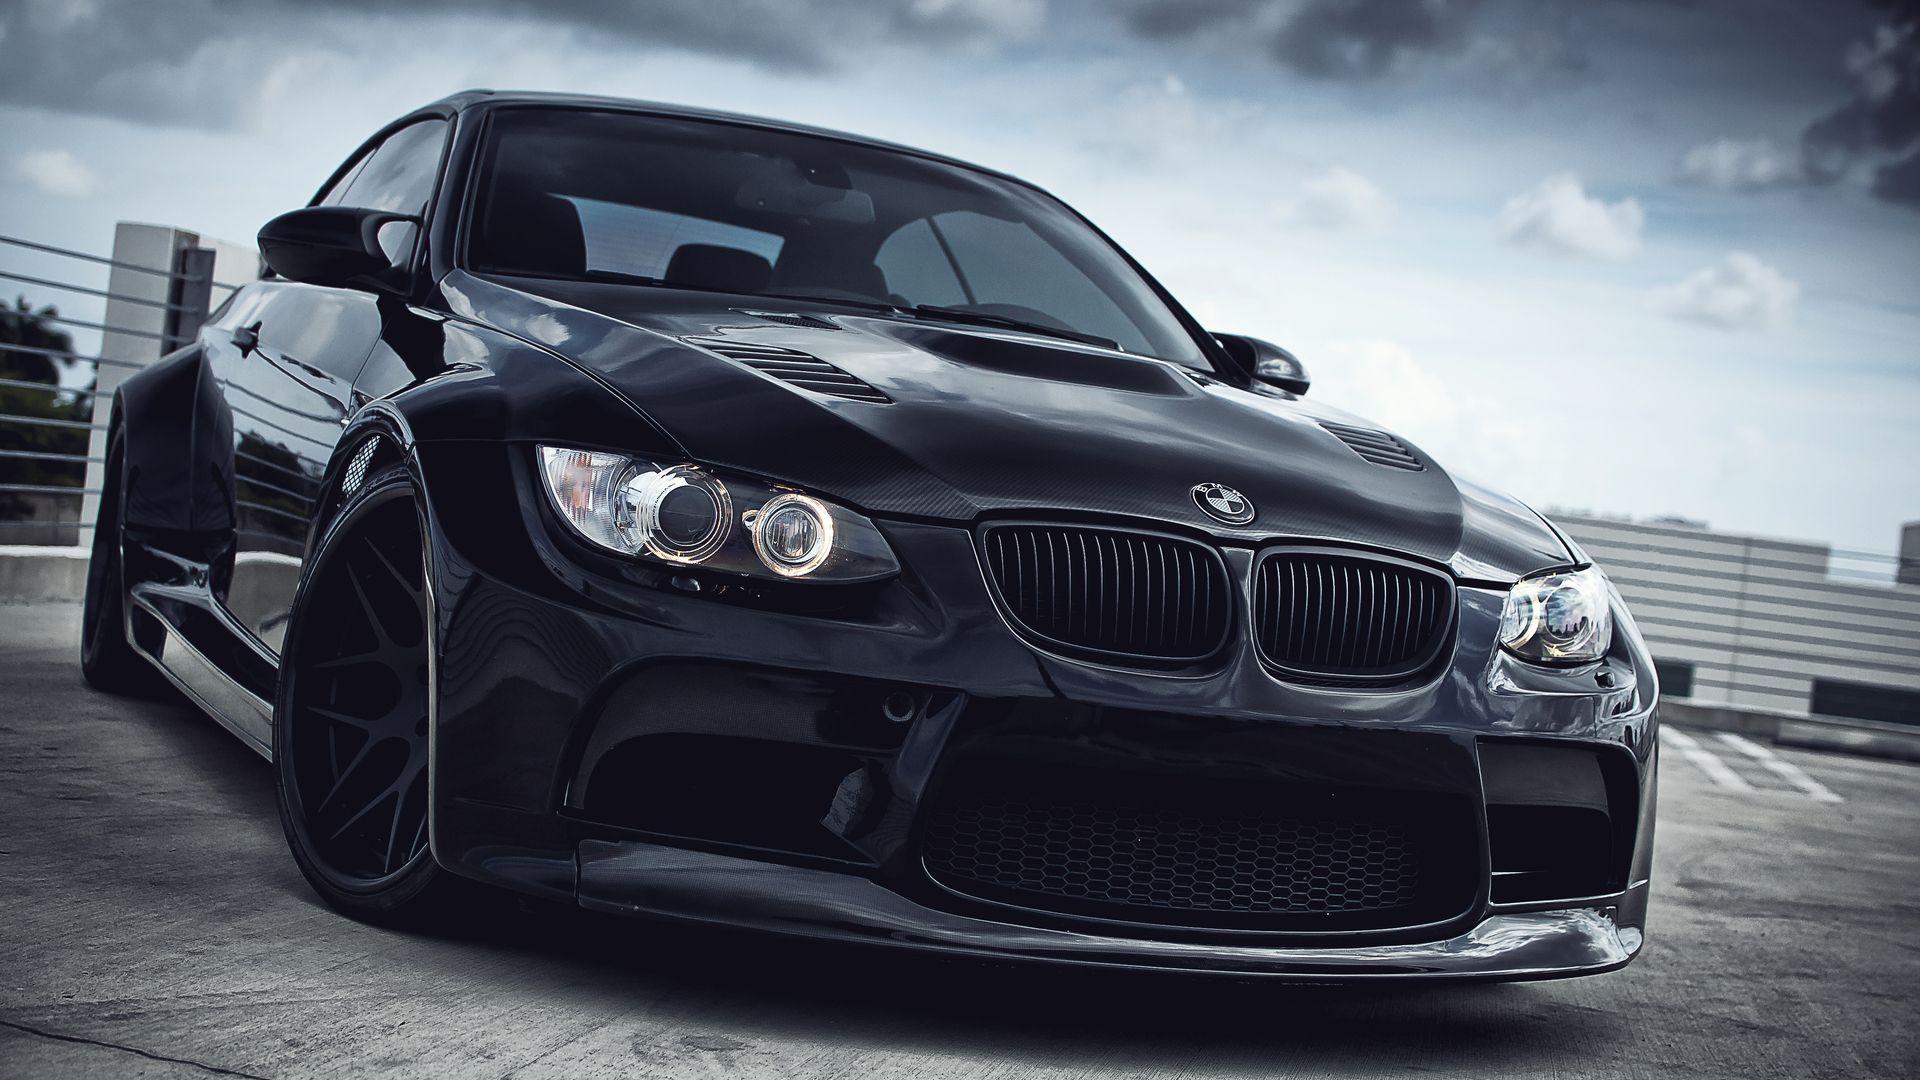 luxury bmw cars wallpaper bmw wallpaper hd download | cars